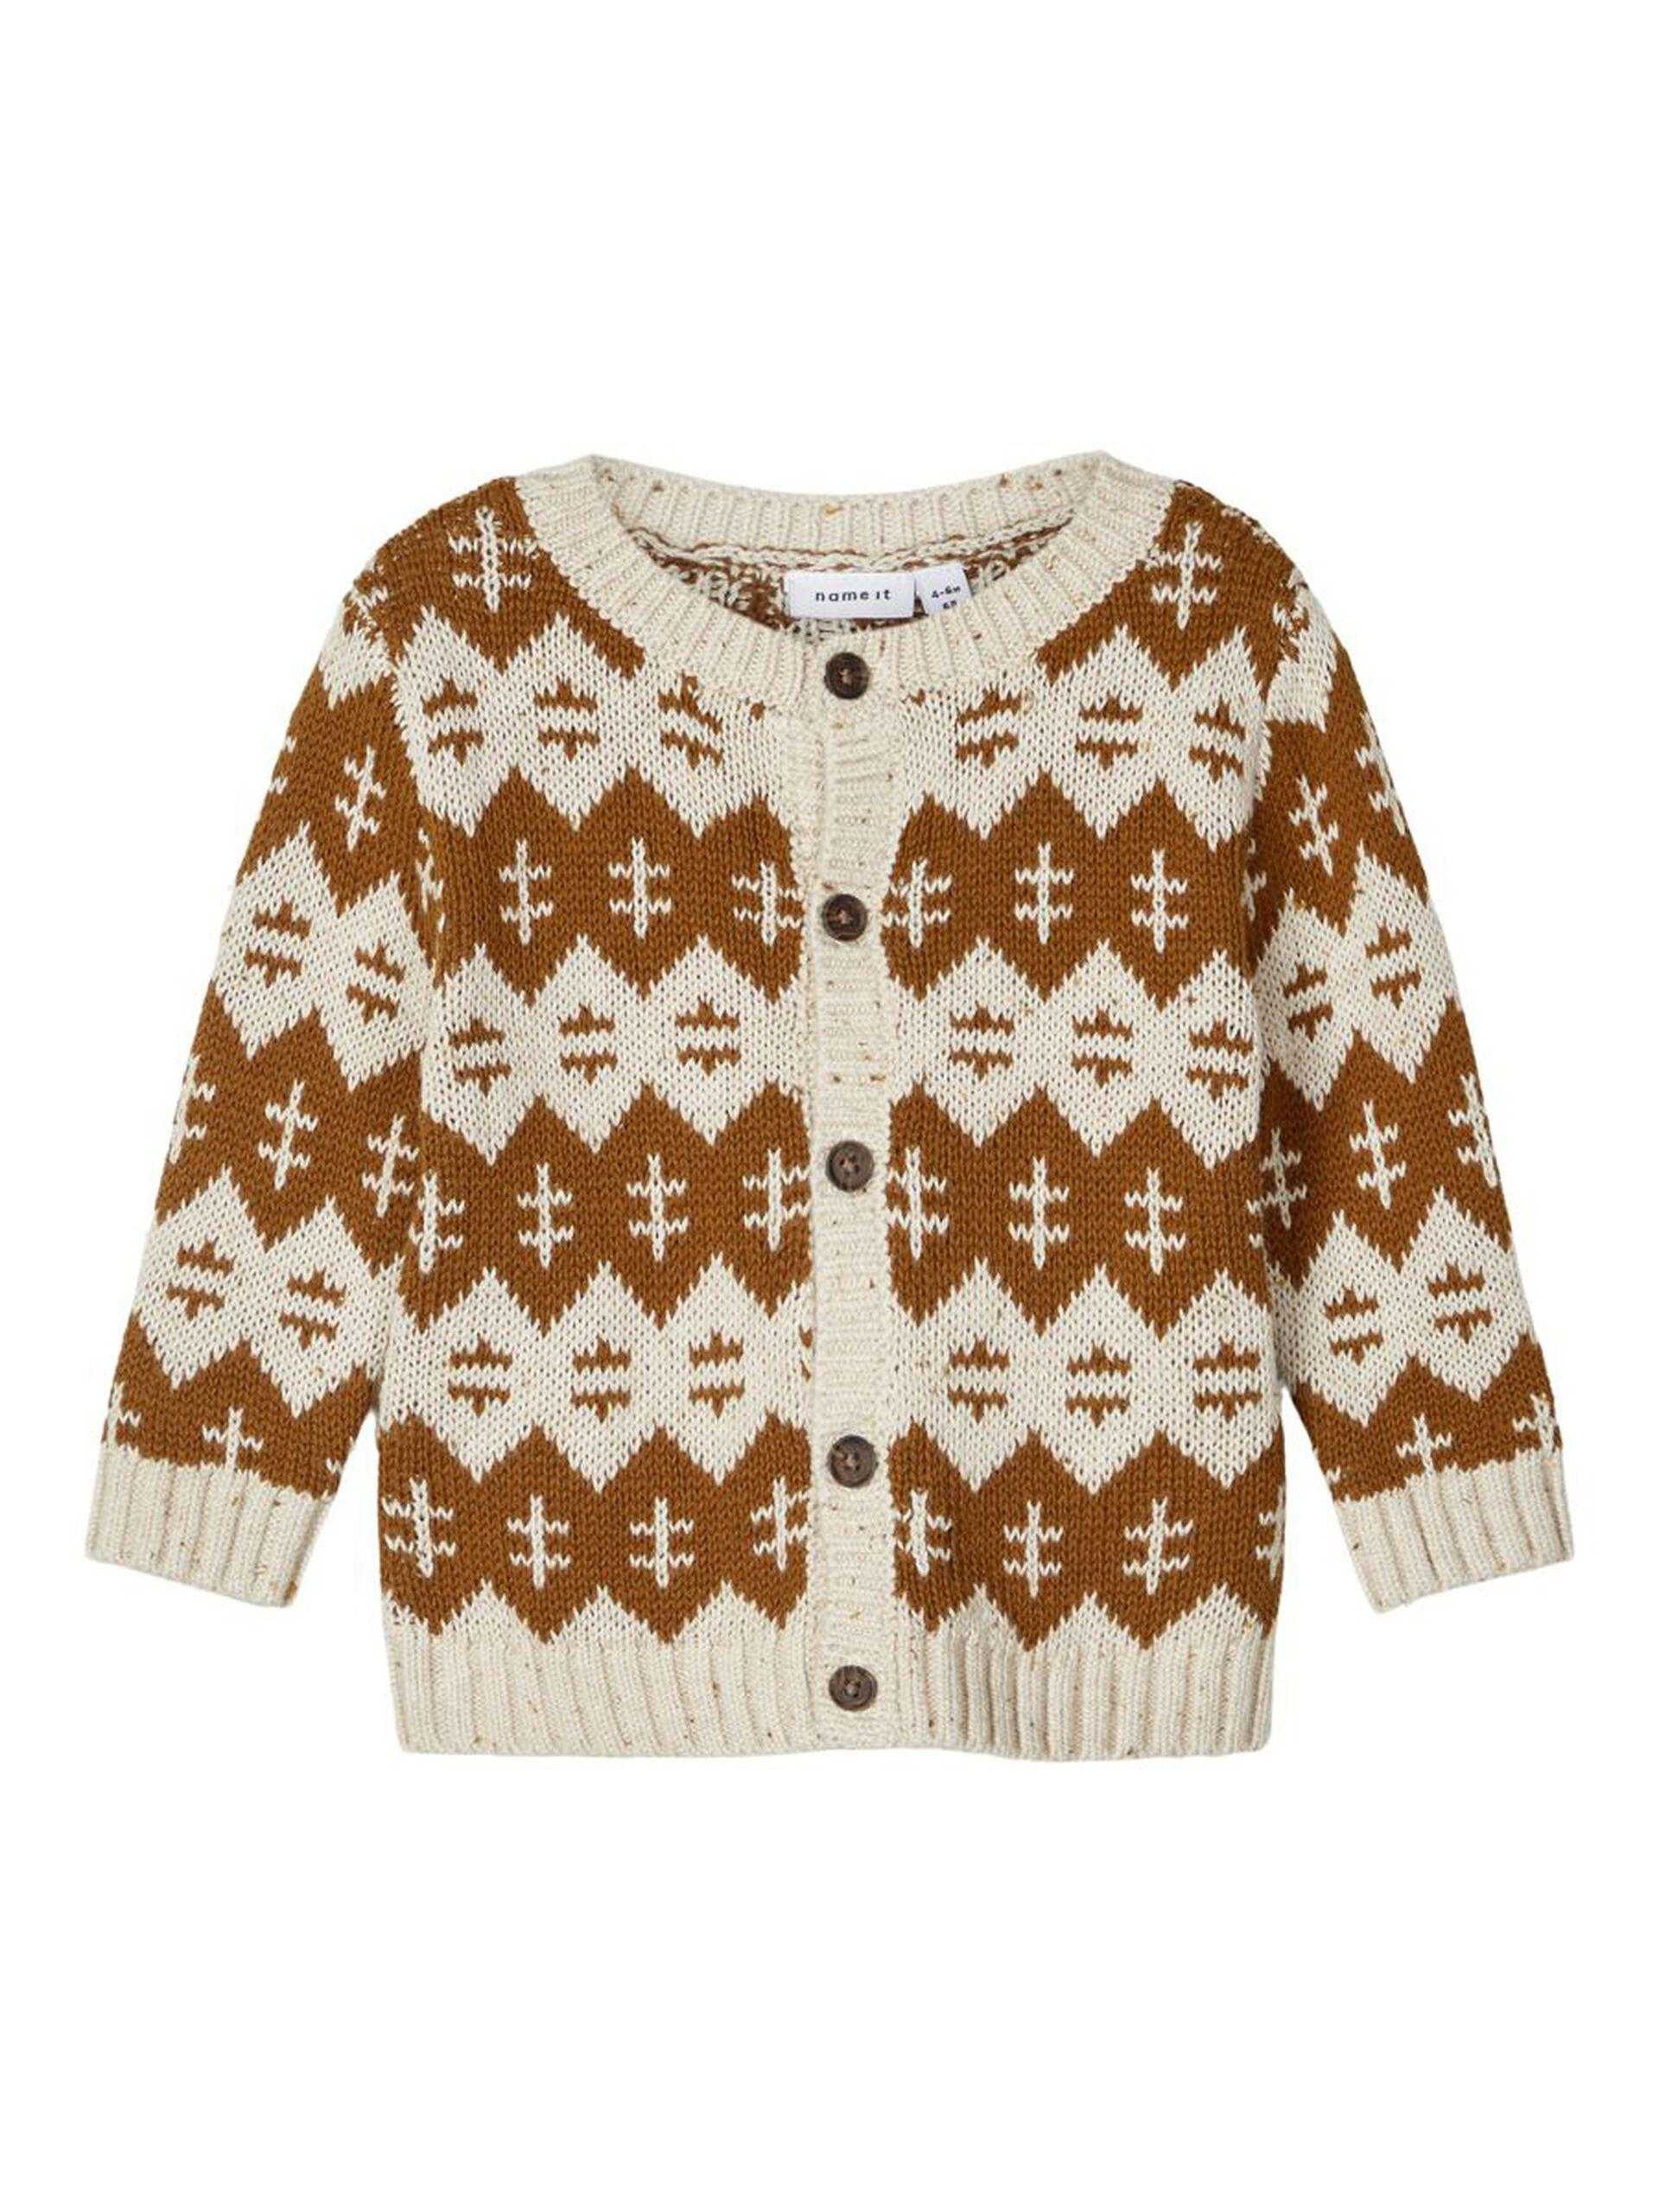 Brun strikkejakke baby – Name It cardigan Remol – Mio Trend